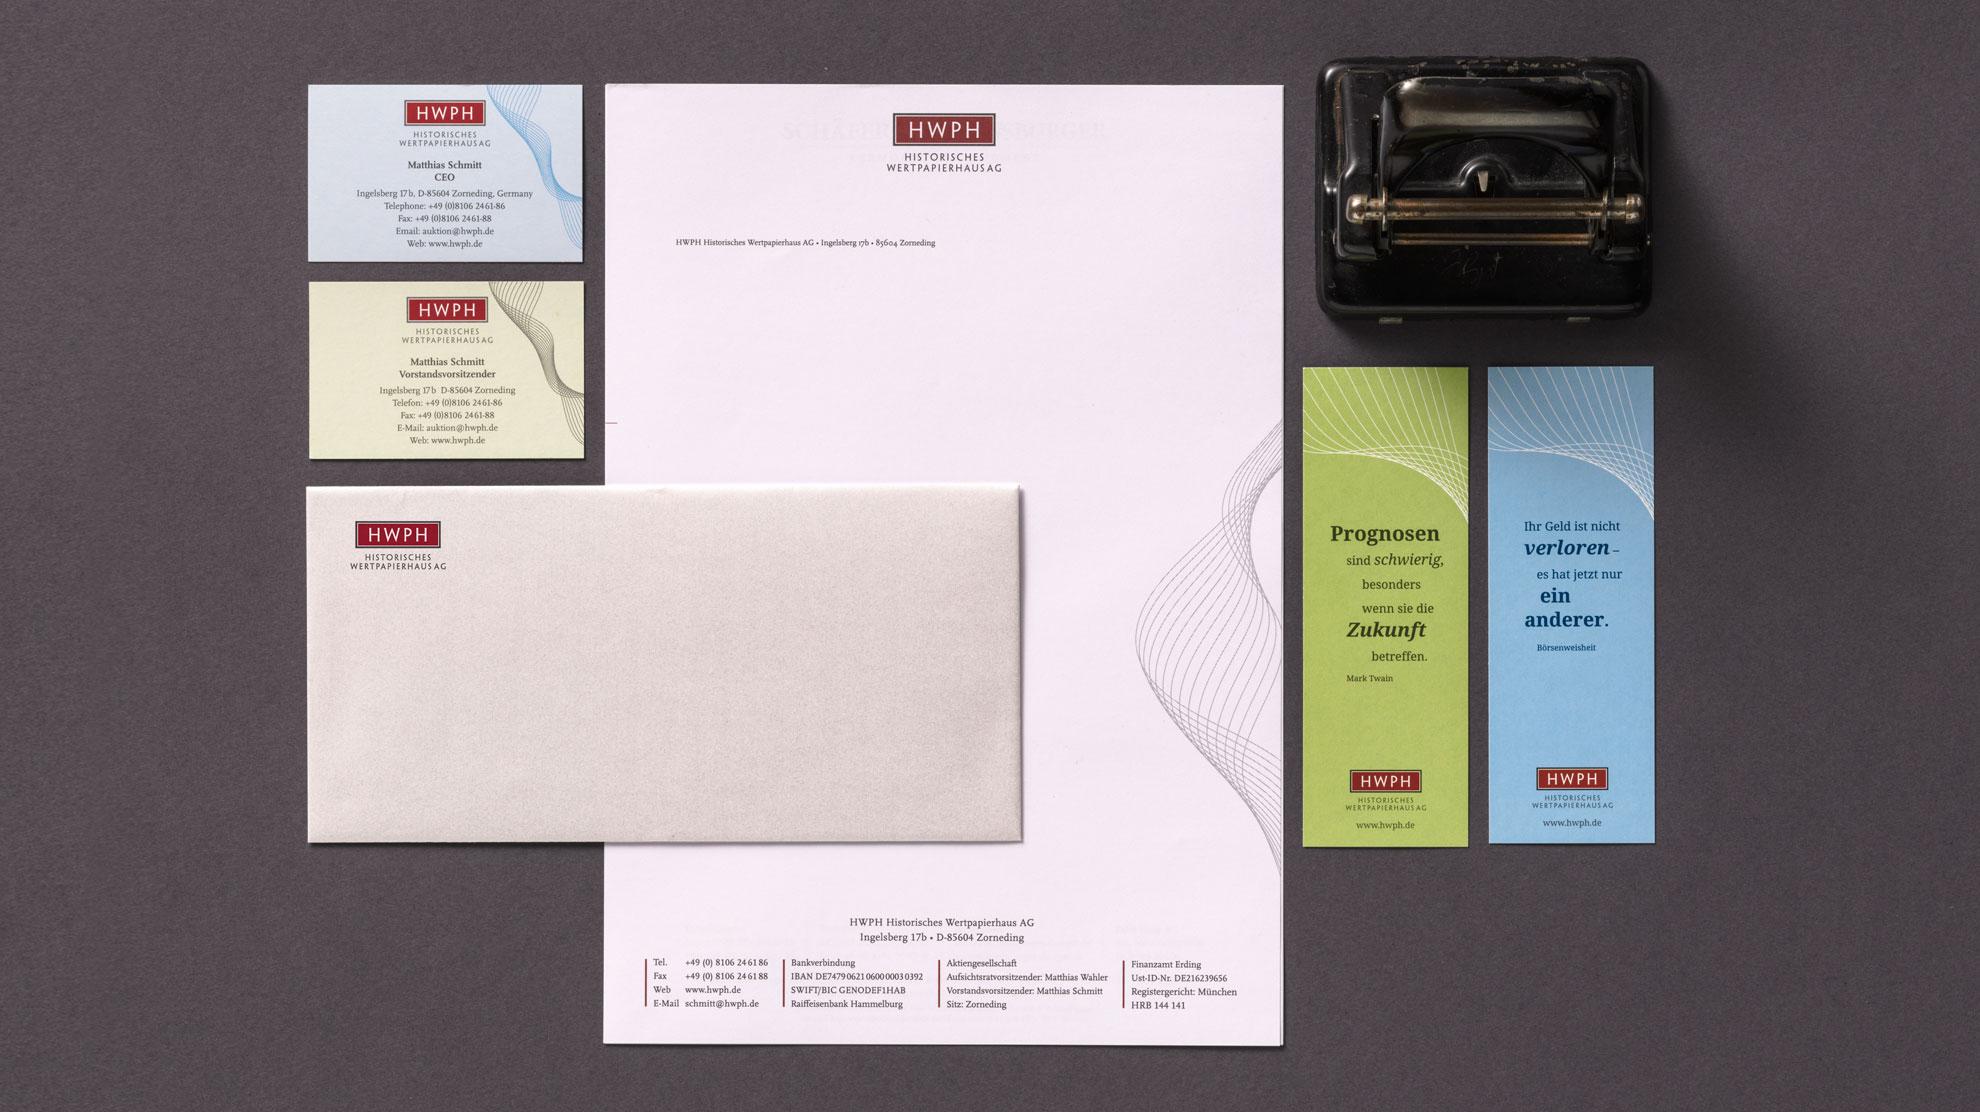 hwph-corporate-design